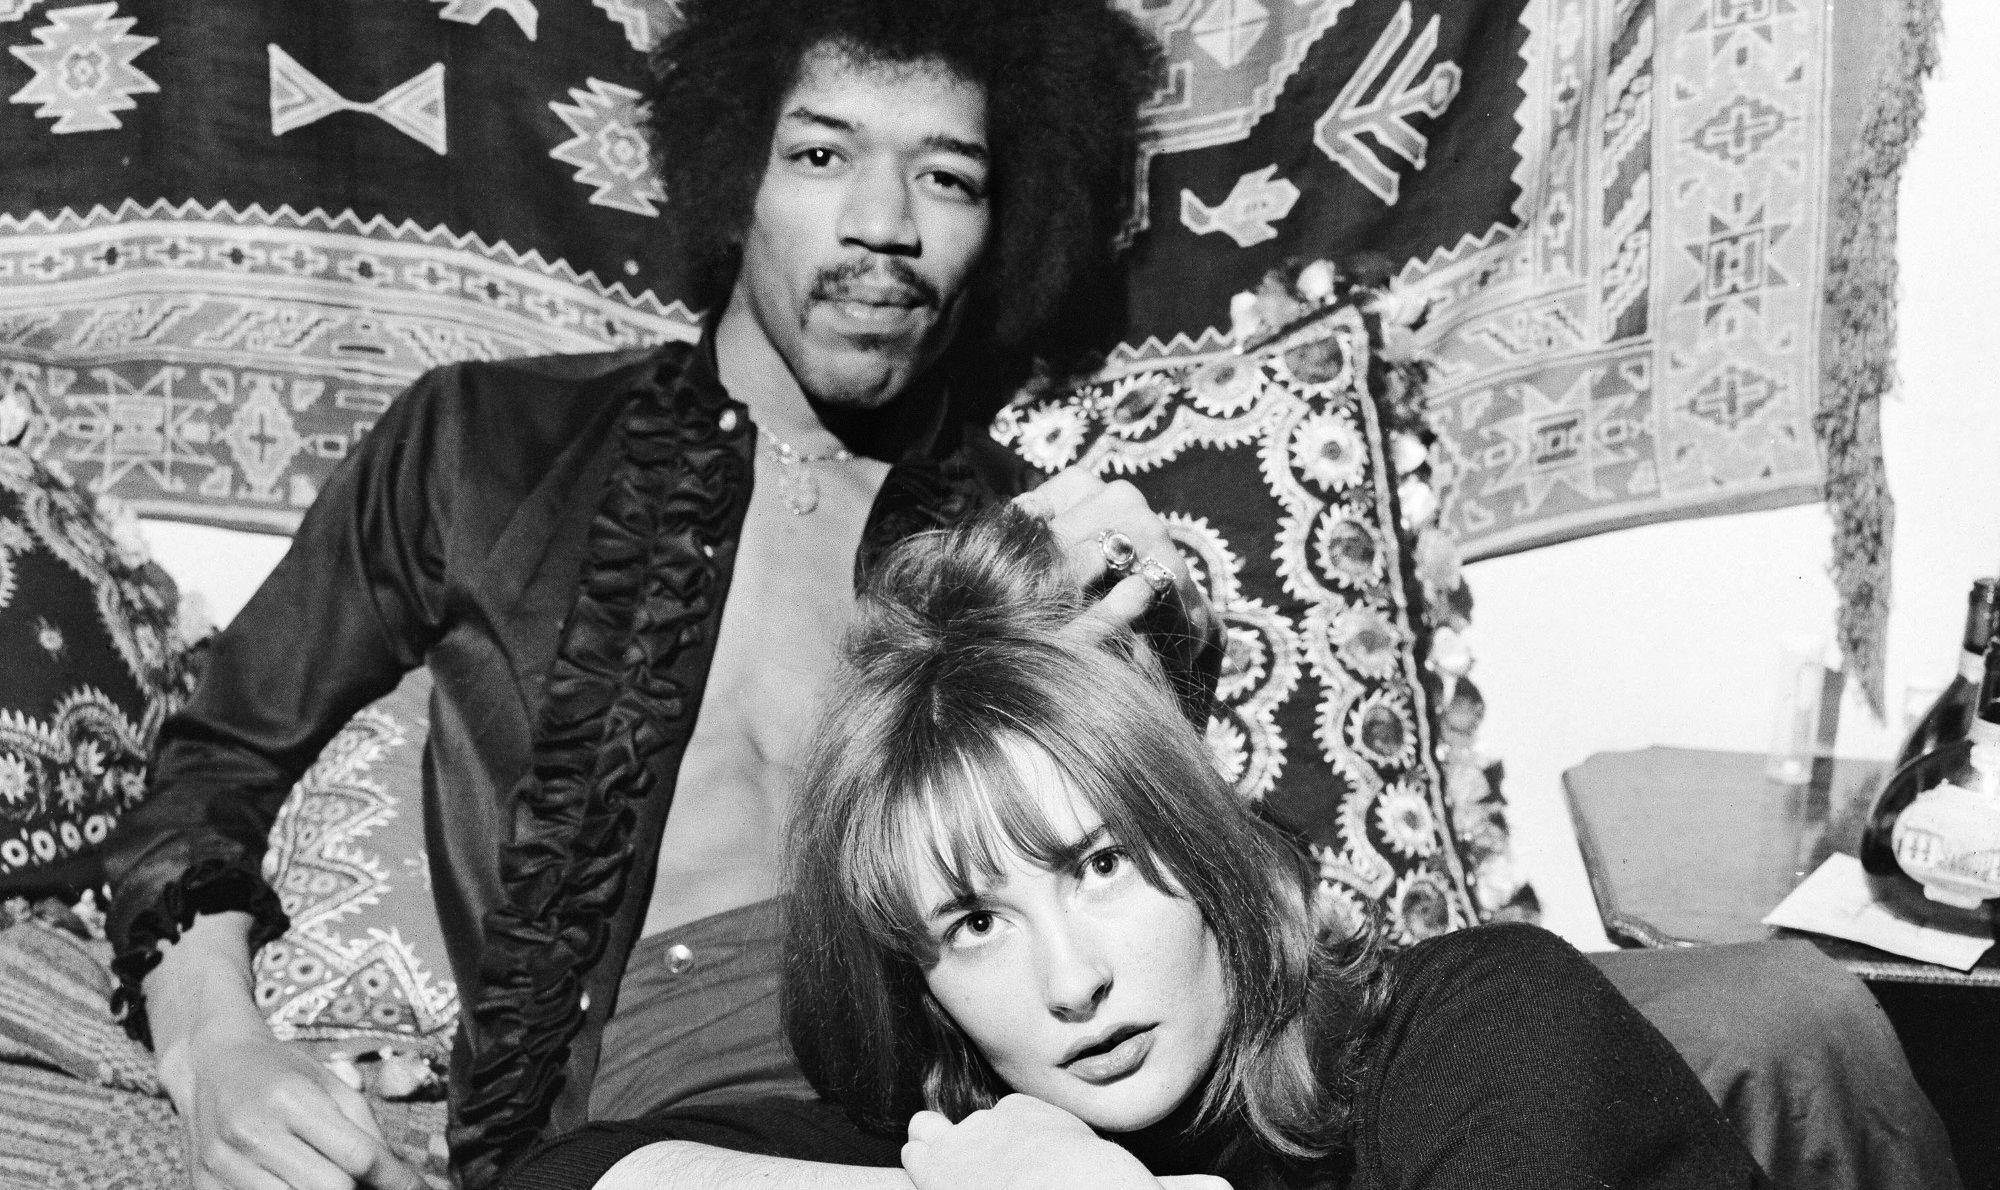 Jimmy Hendrix & Kathy Etchingham